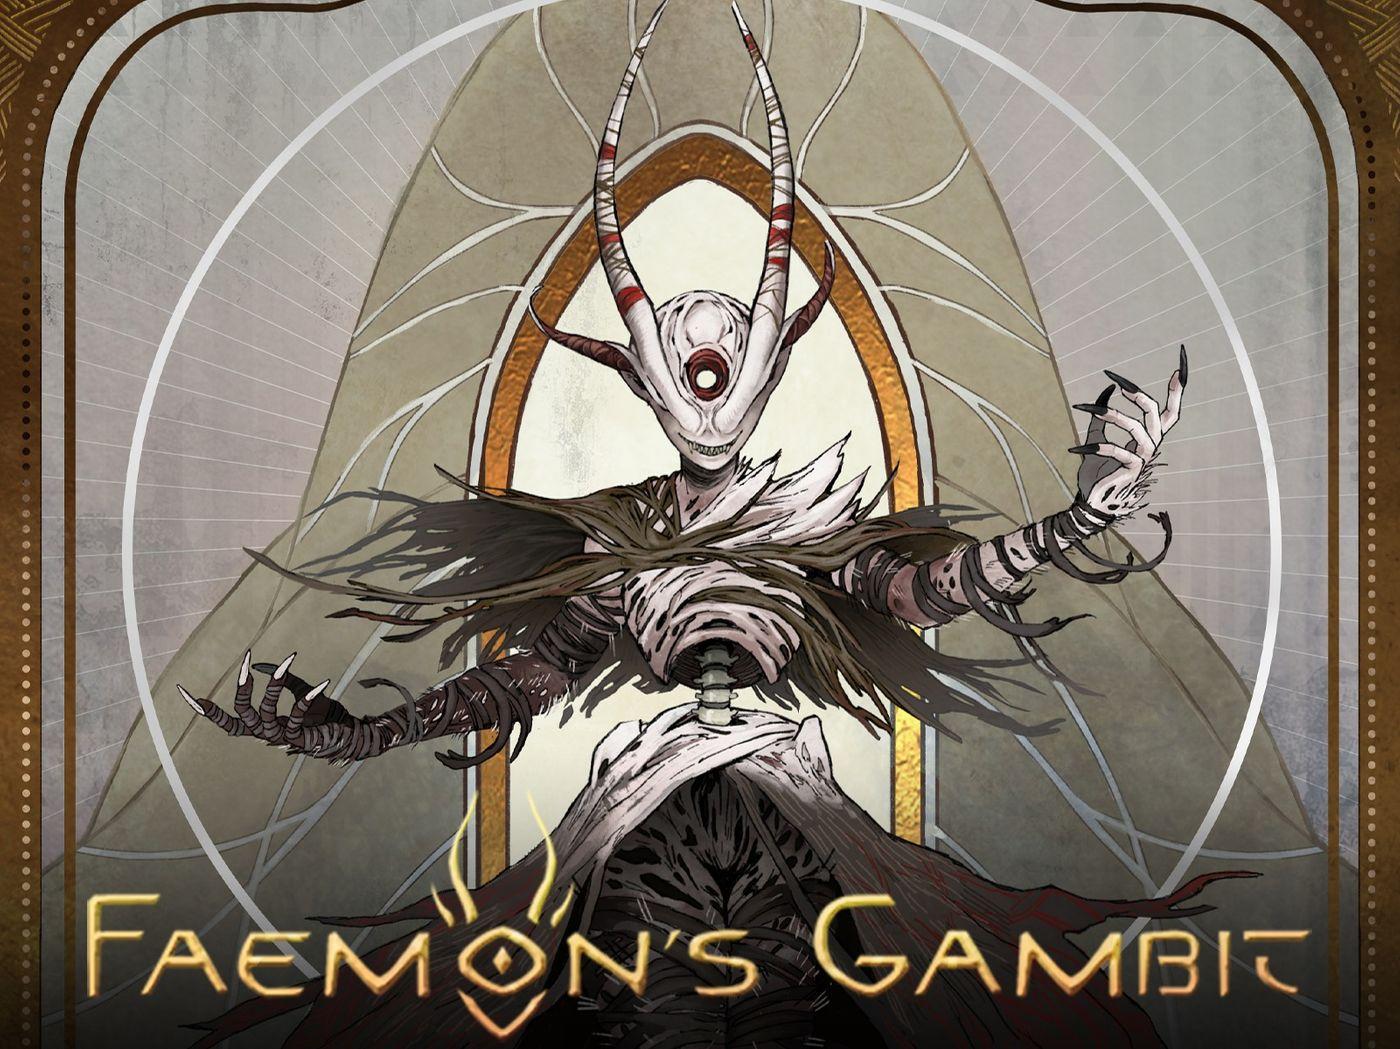 Faemon's Gambit + Miscellaneous Works